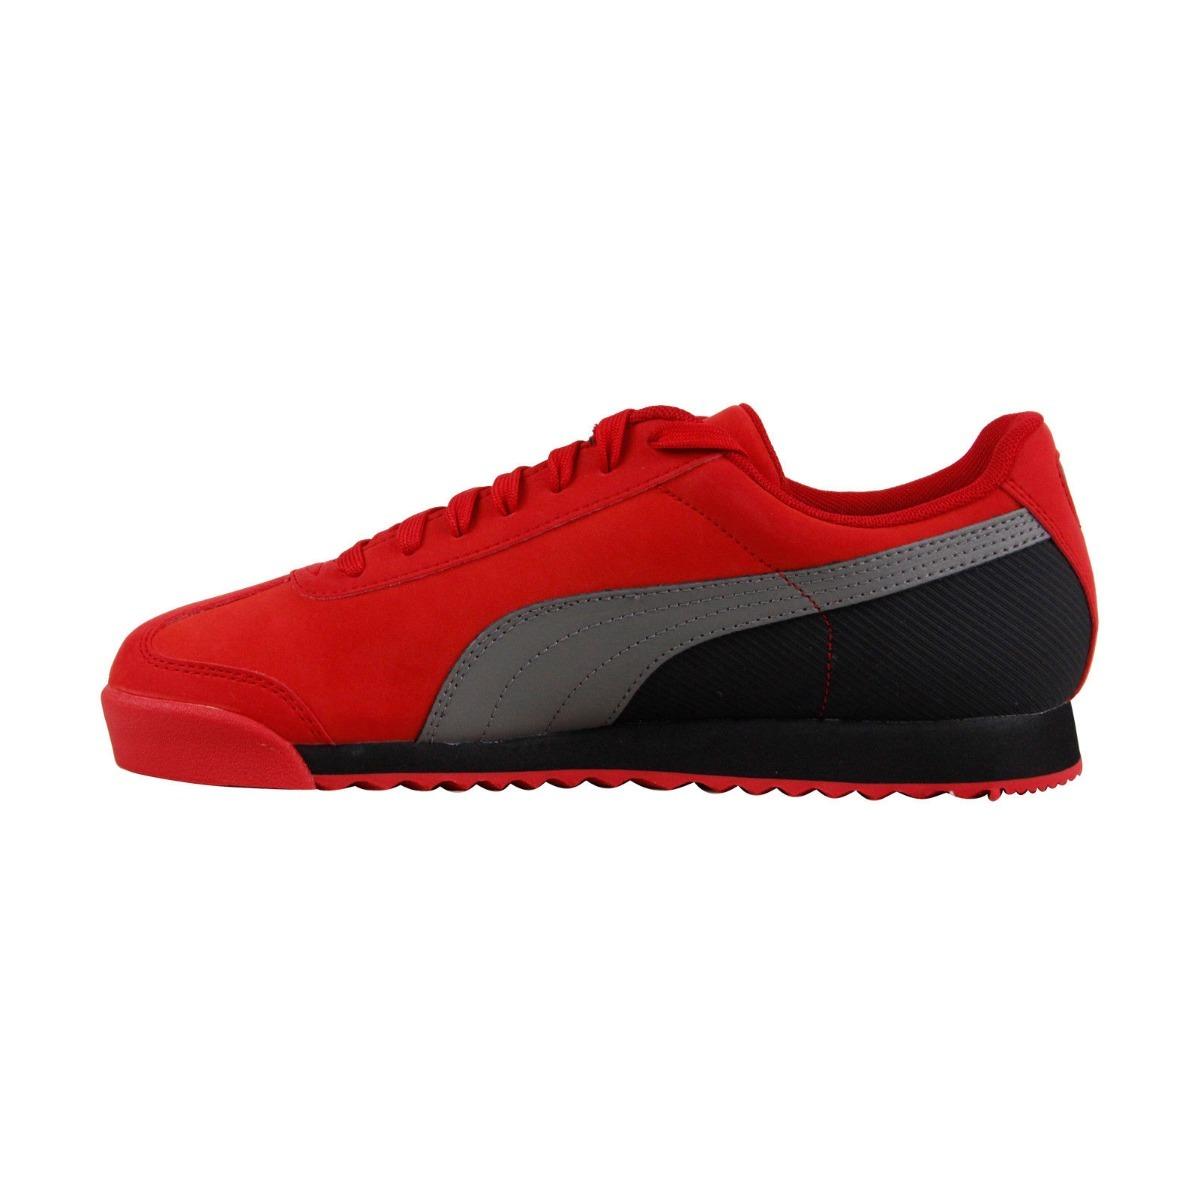 0425695996dd zapatillas puma roma retro mens red - a pedido exkarg. Cargando zoom.